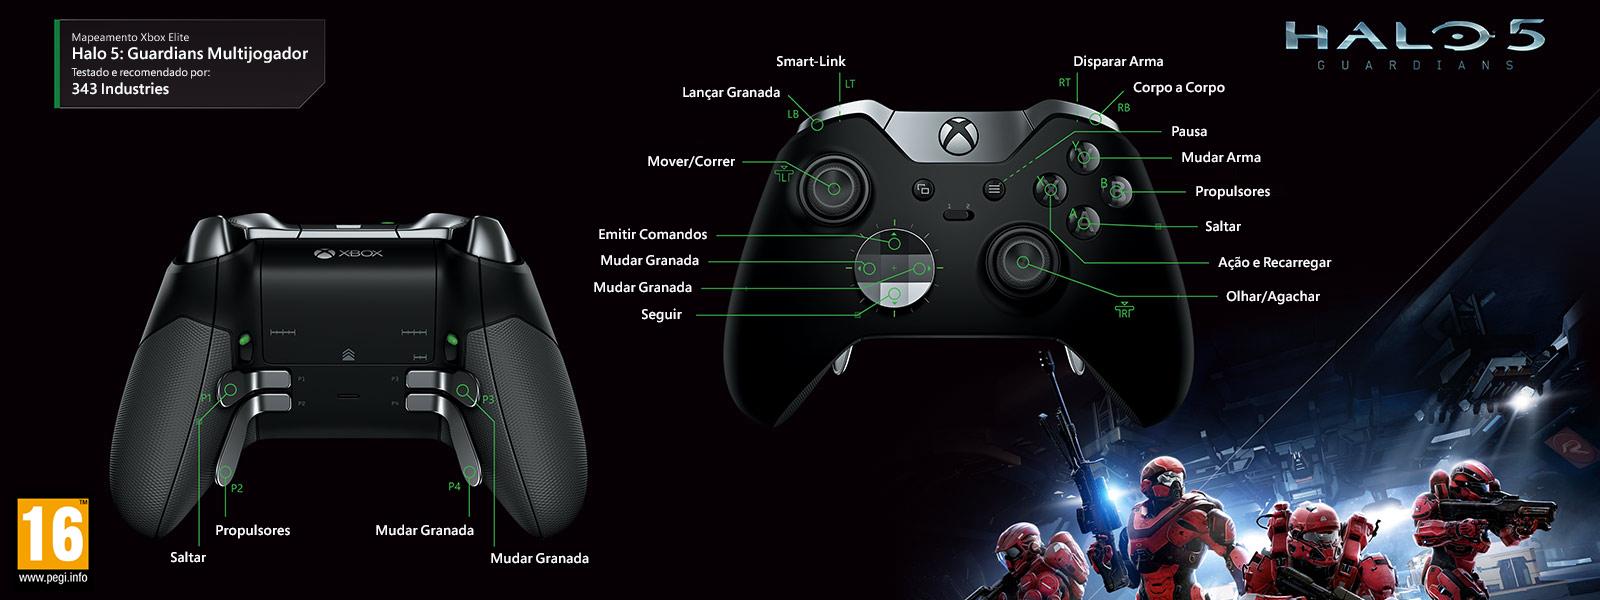 Mapeamento Elite para Halo 5 – Guardians Multiplayer